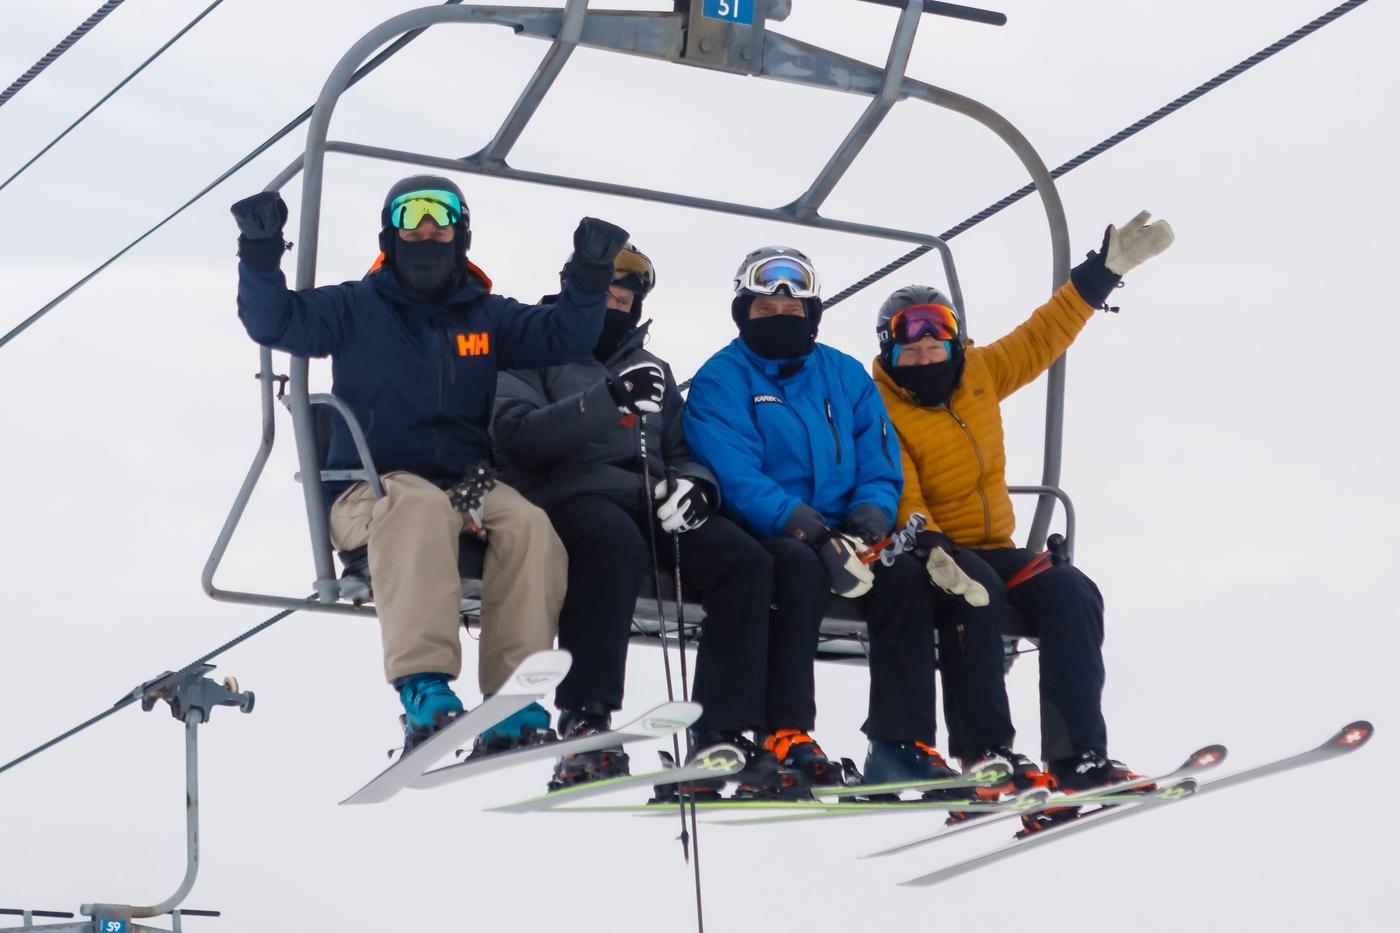 WinterKids Downhill 24 2021 SDP 2771